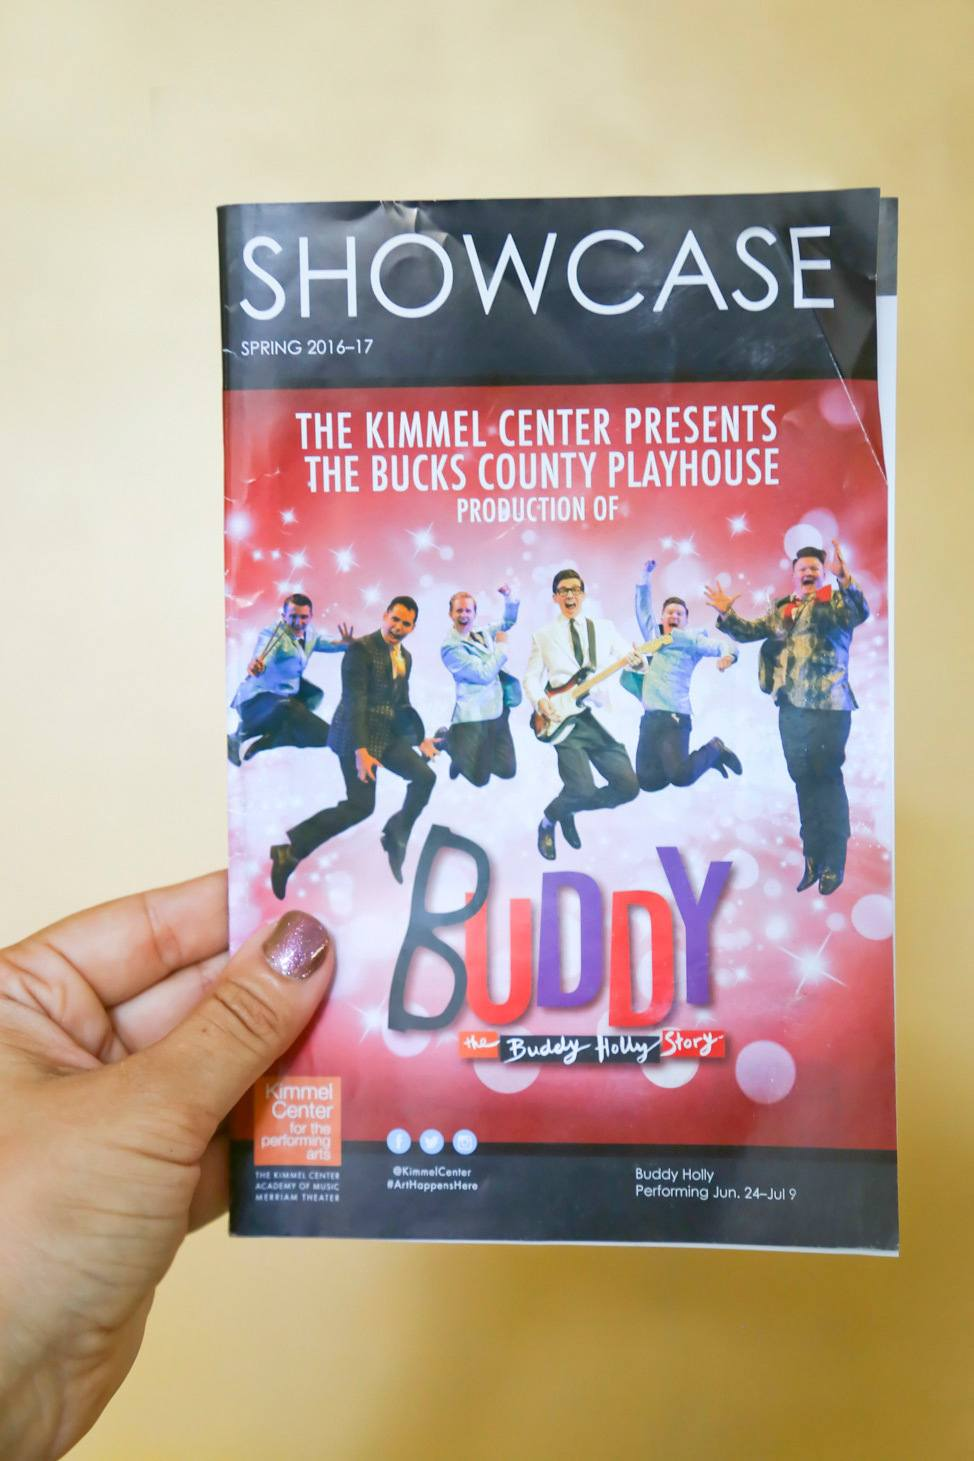 Buddy: The Buddy Holly Story at Kimmel Center Philadelphia